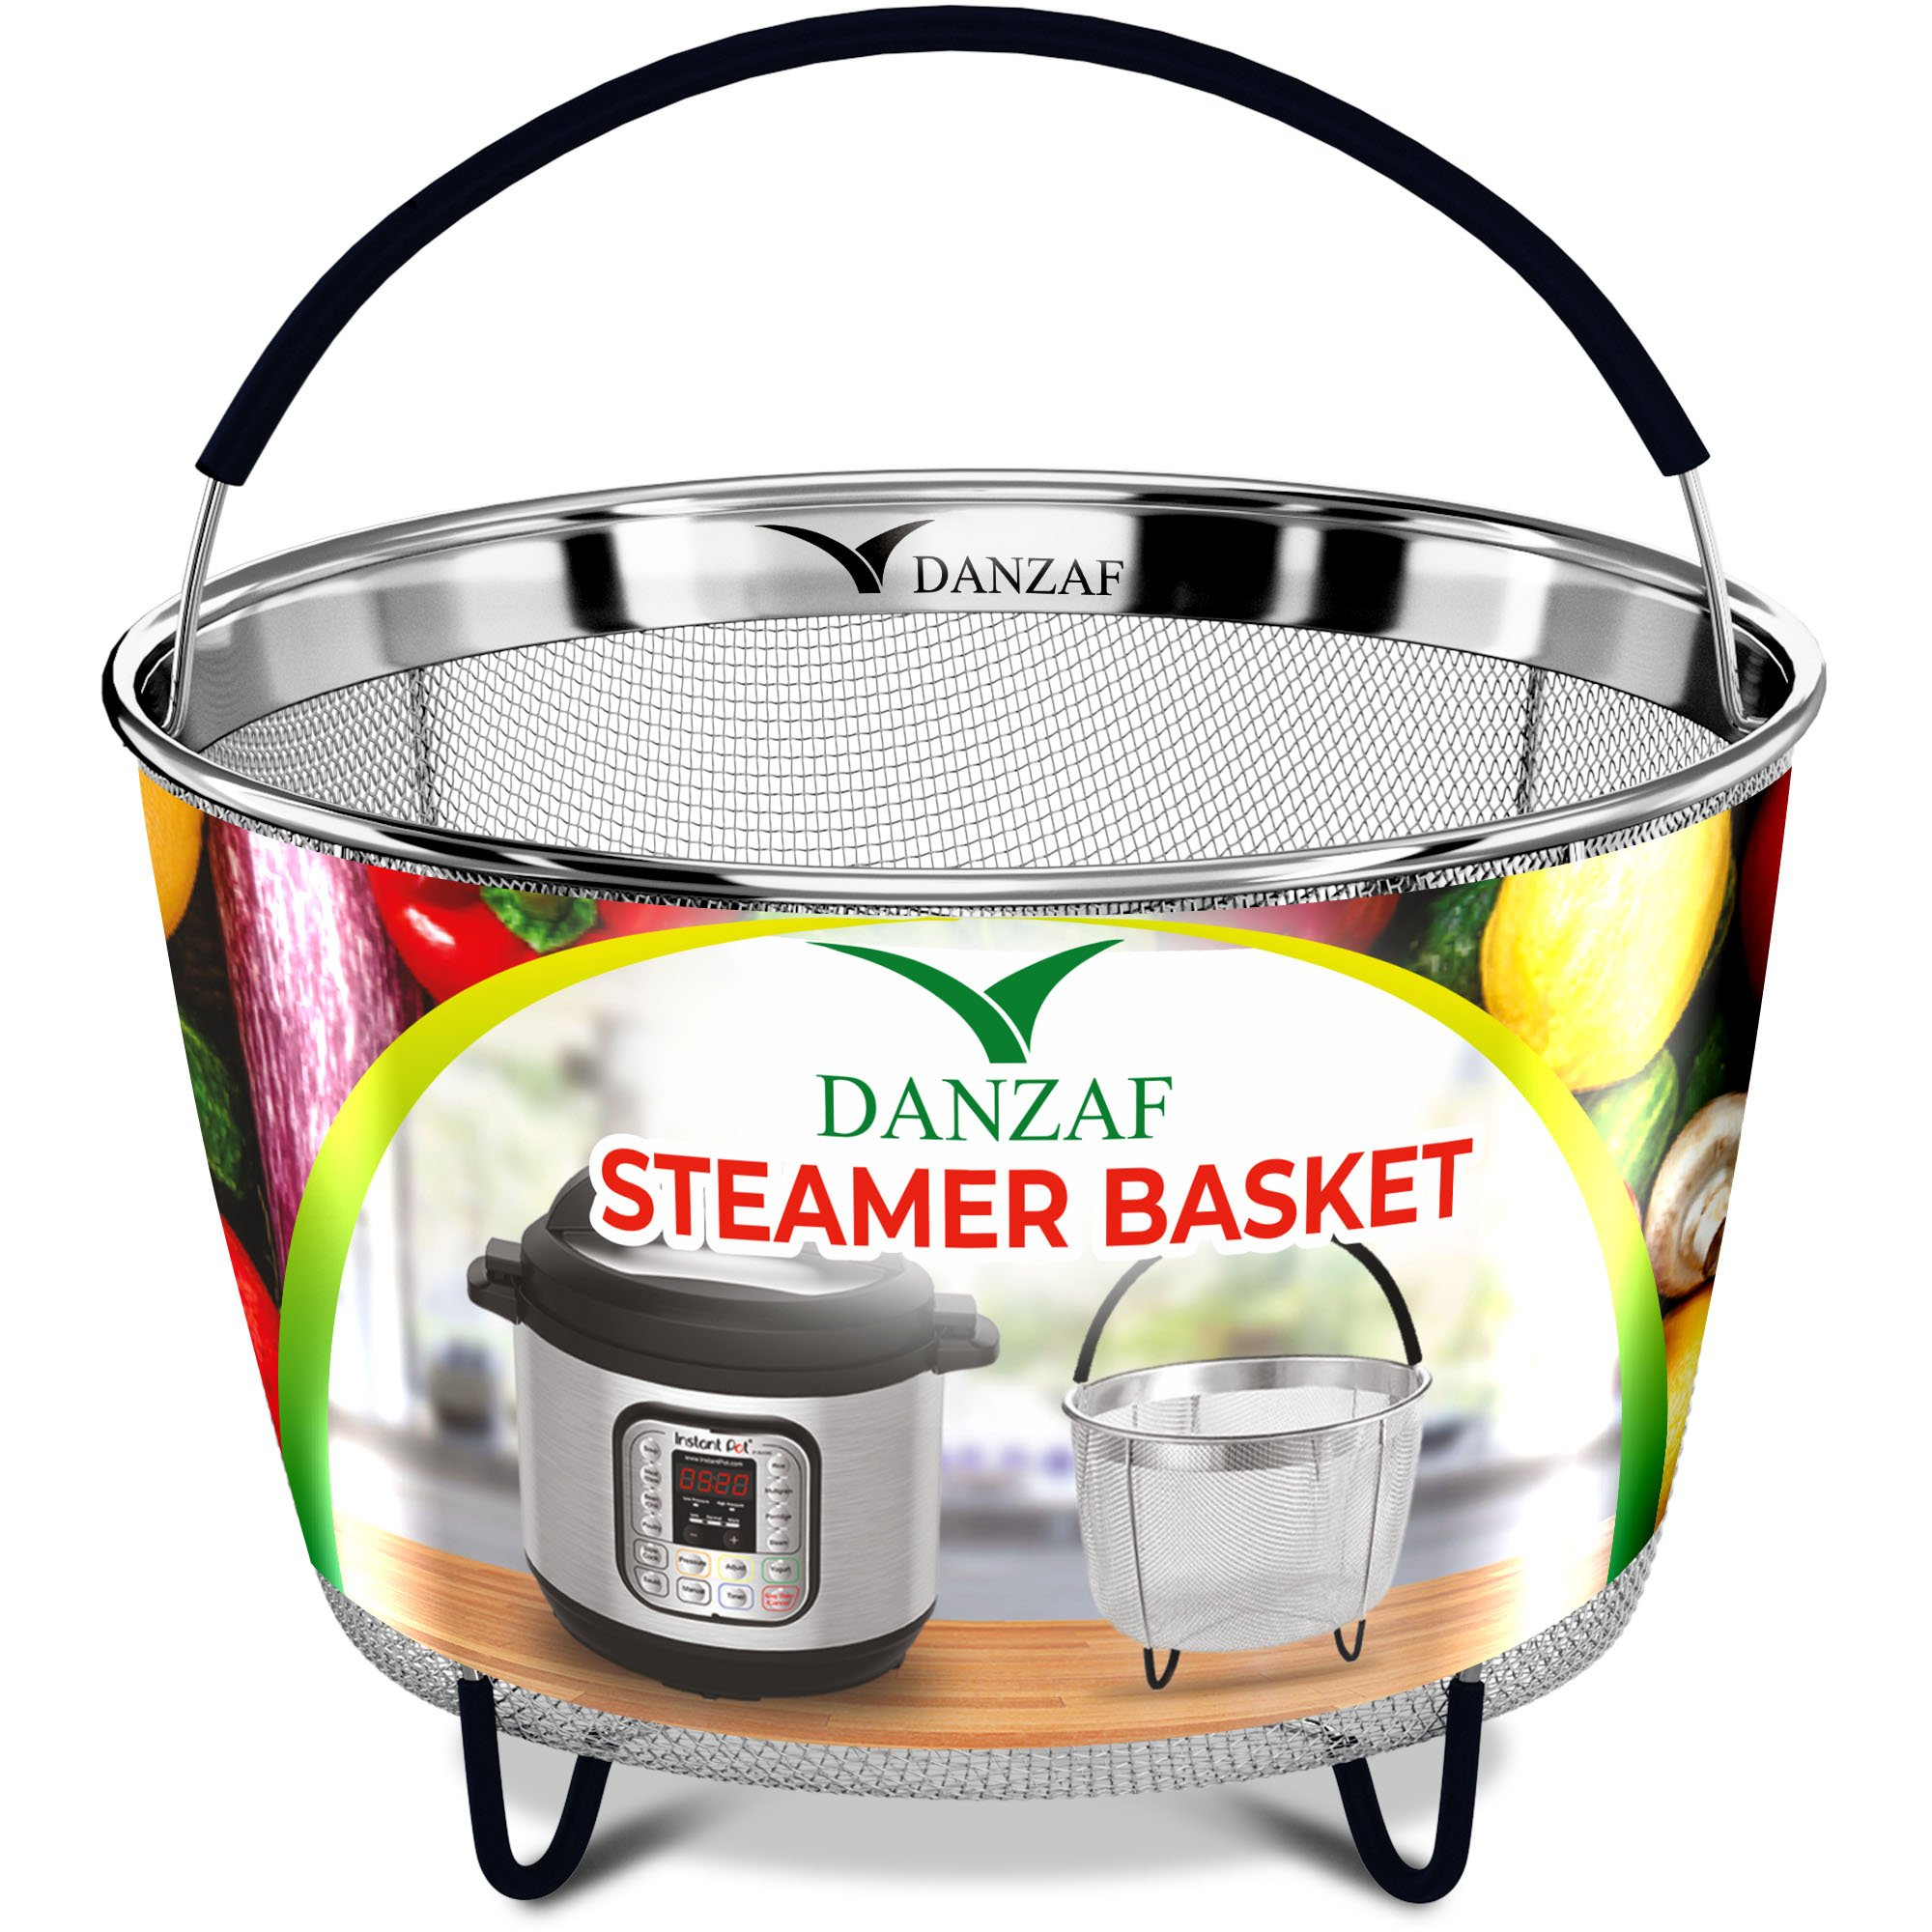 Instant Pot Accessories Steamer Basket 6qt - Pressure Cooker Accessories - Instant Pot Steamer Rack Stand Trivet - Egg Rack - Instant Pot Stainless Steel Strainer Steamer Basket – InstaPot steaming